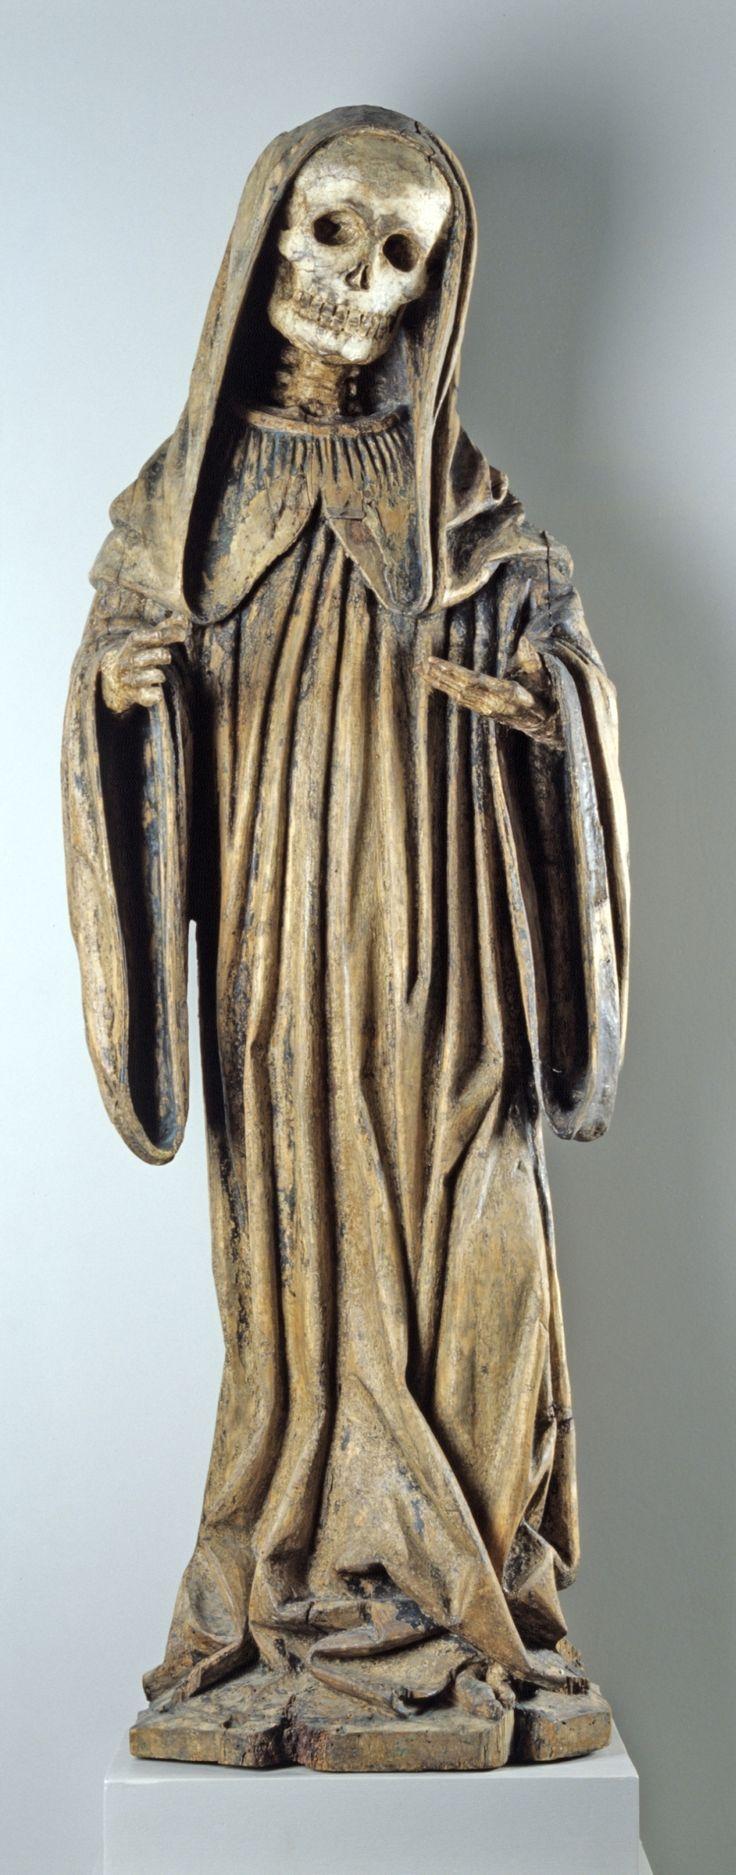 Tod in Mönchskutte: Ende 15. Jahrhundert, Badisches Landesmuseum Karlsruhe.